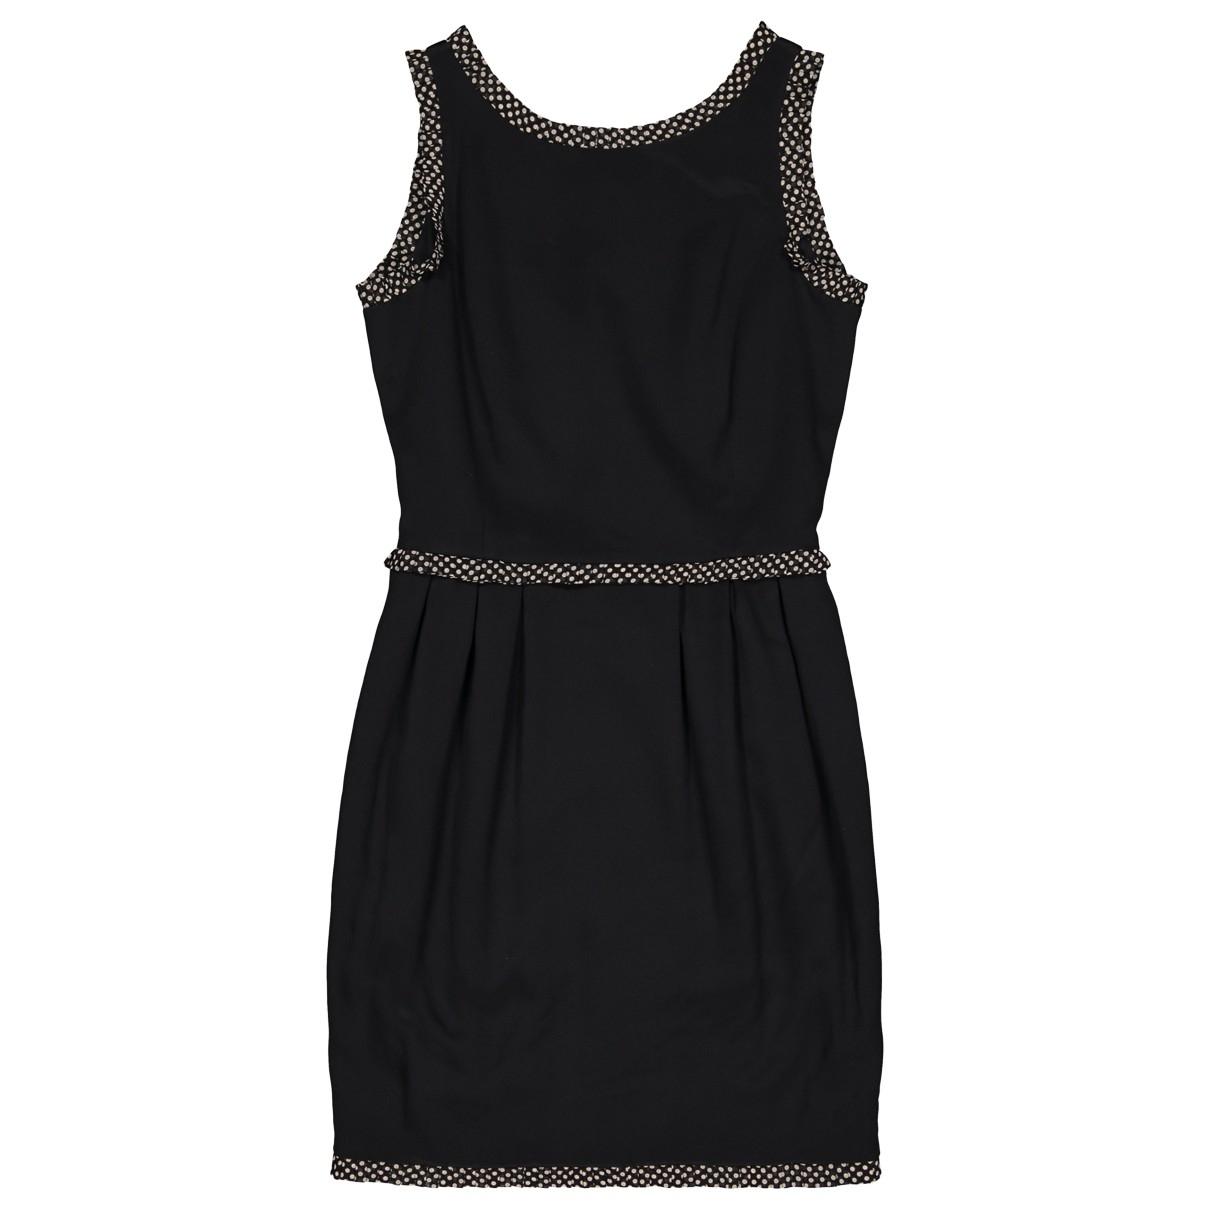 Valentino Garavani \N Black dress for Women 8 UK